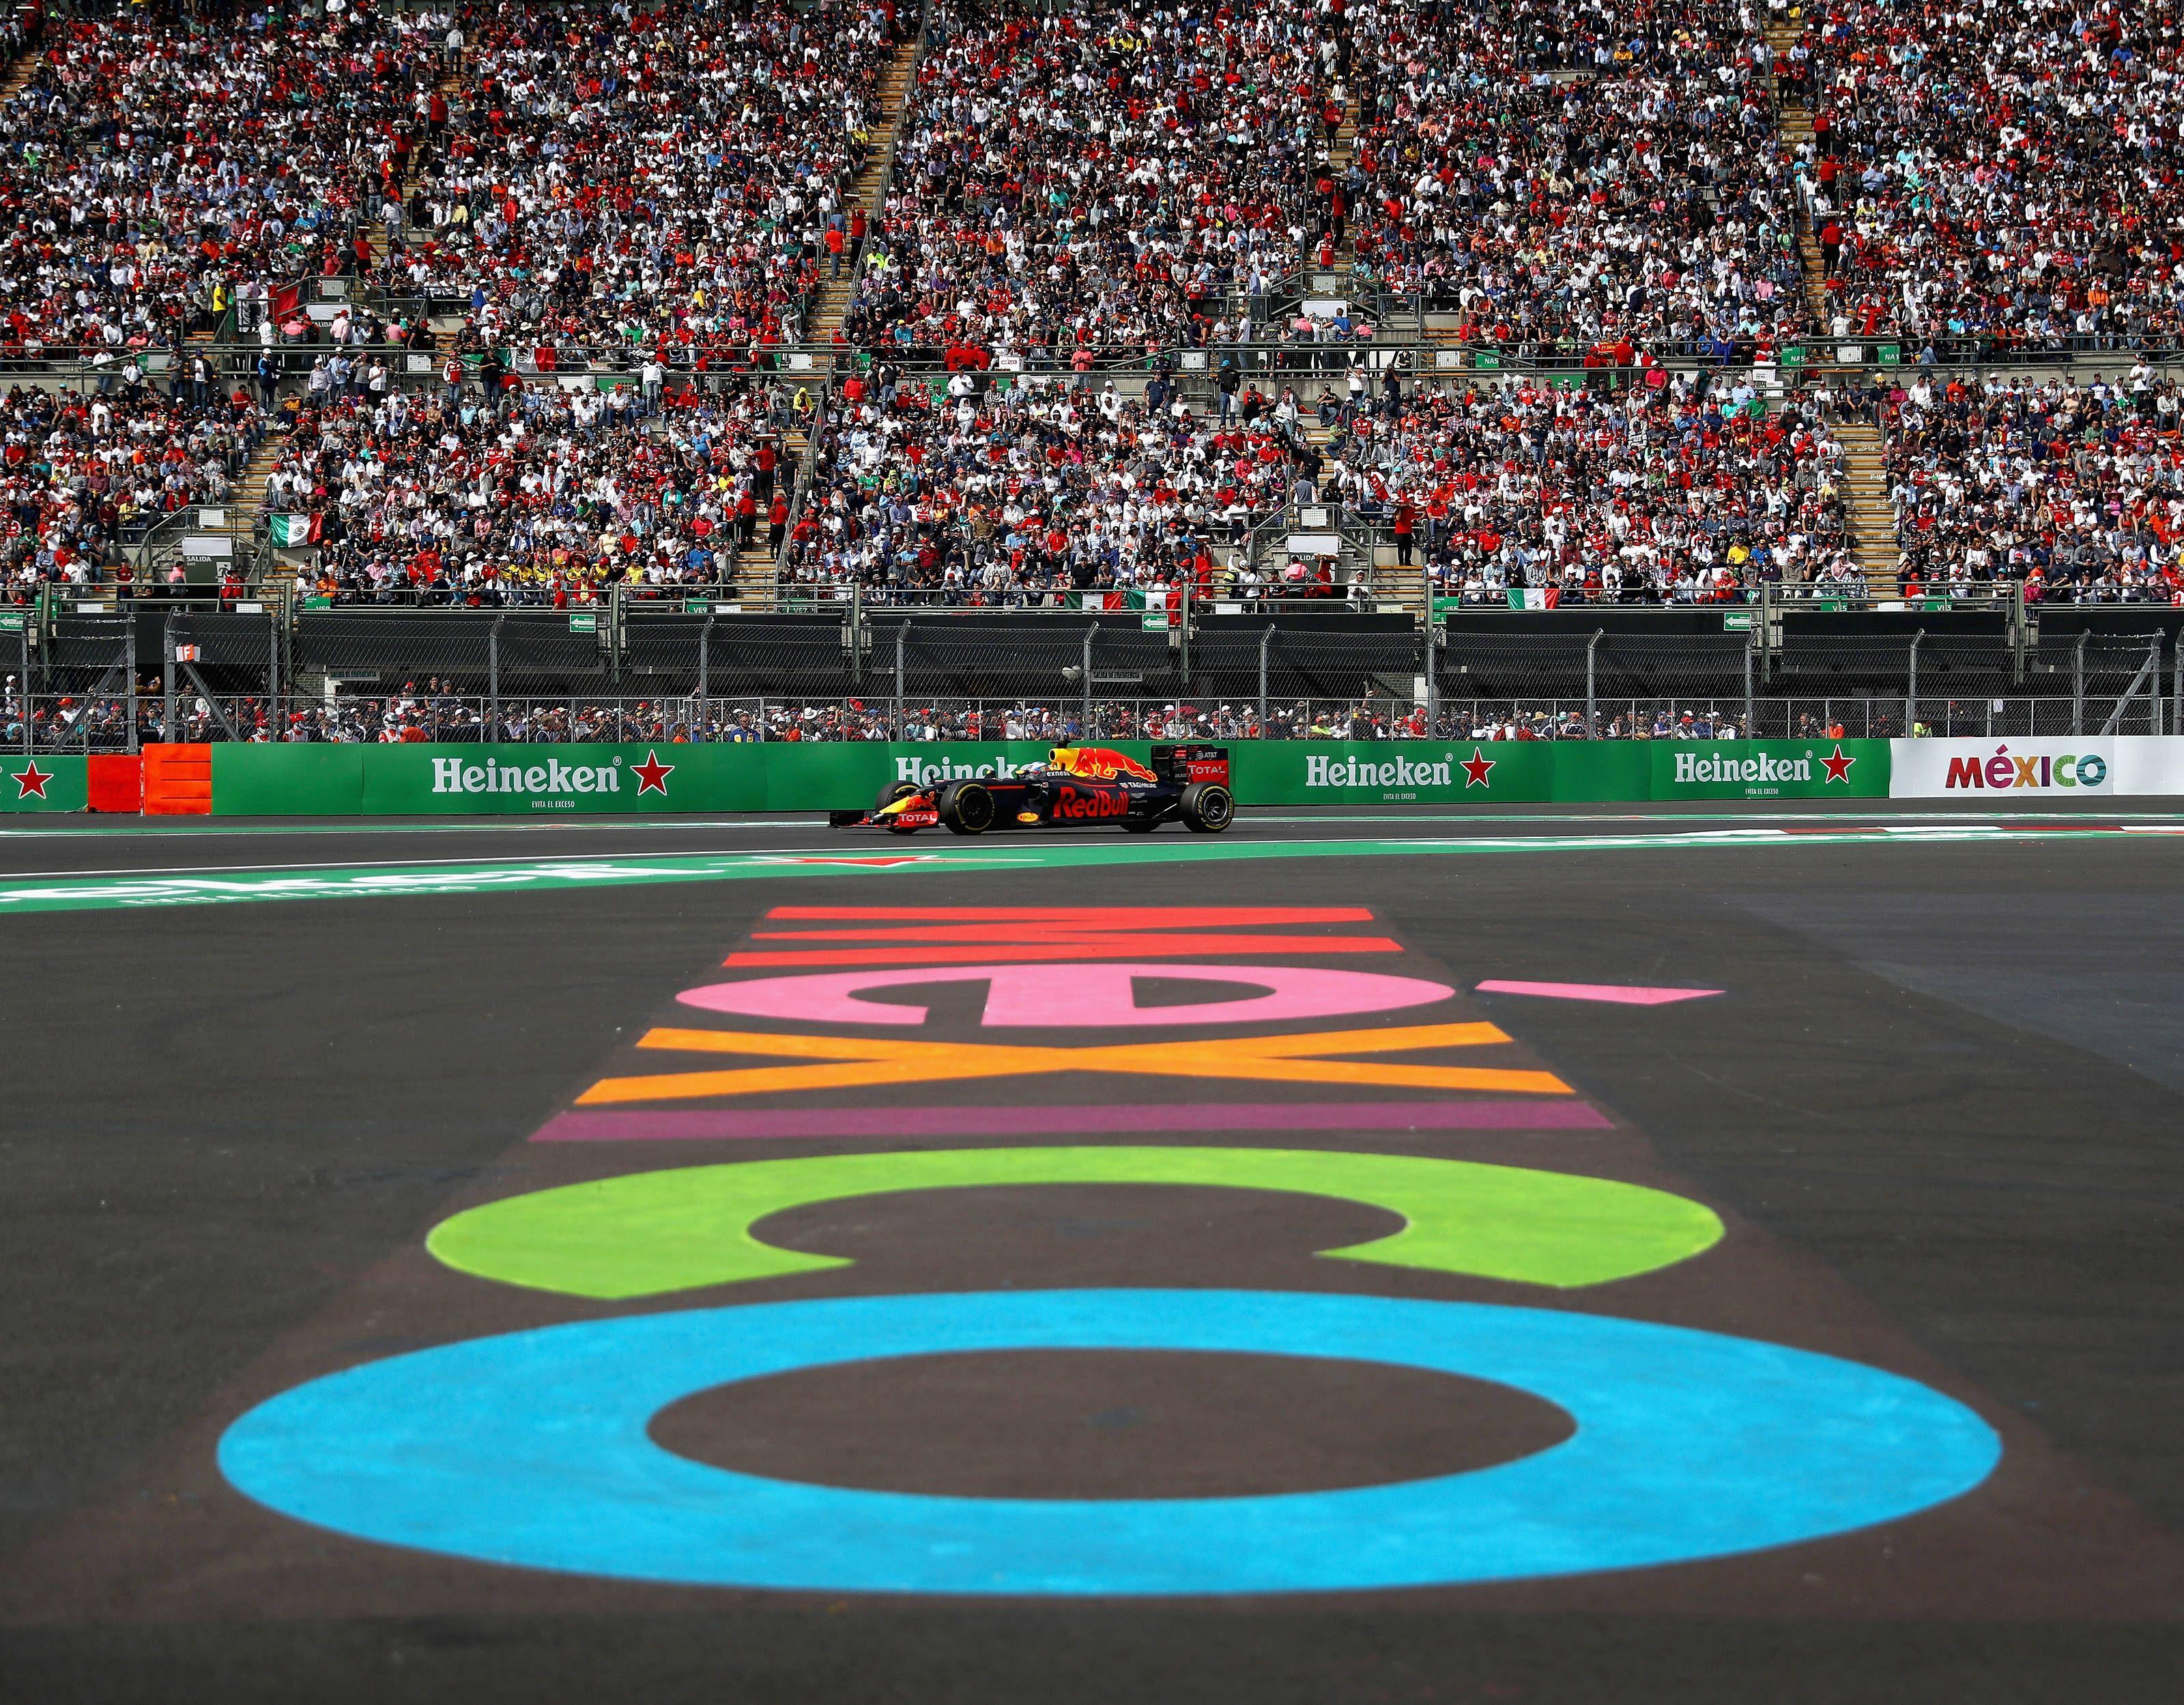 Wordt Max Verstappen Genaaid En Krijgt Vettel Een Schorsing Gran Premio De Mexico Gran Premio De Brasil Gran Premio